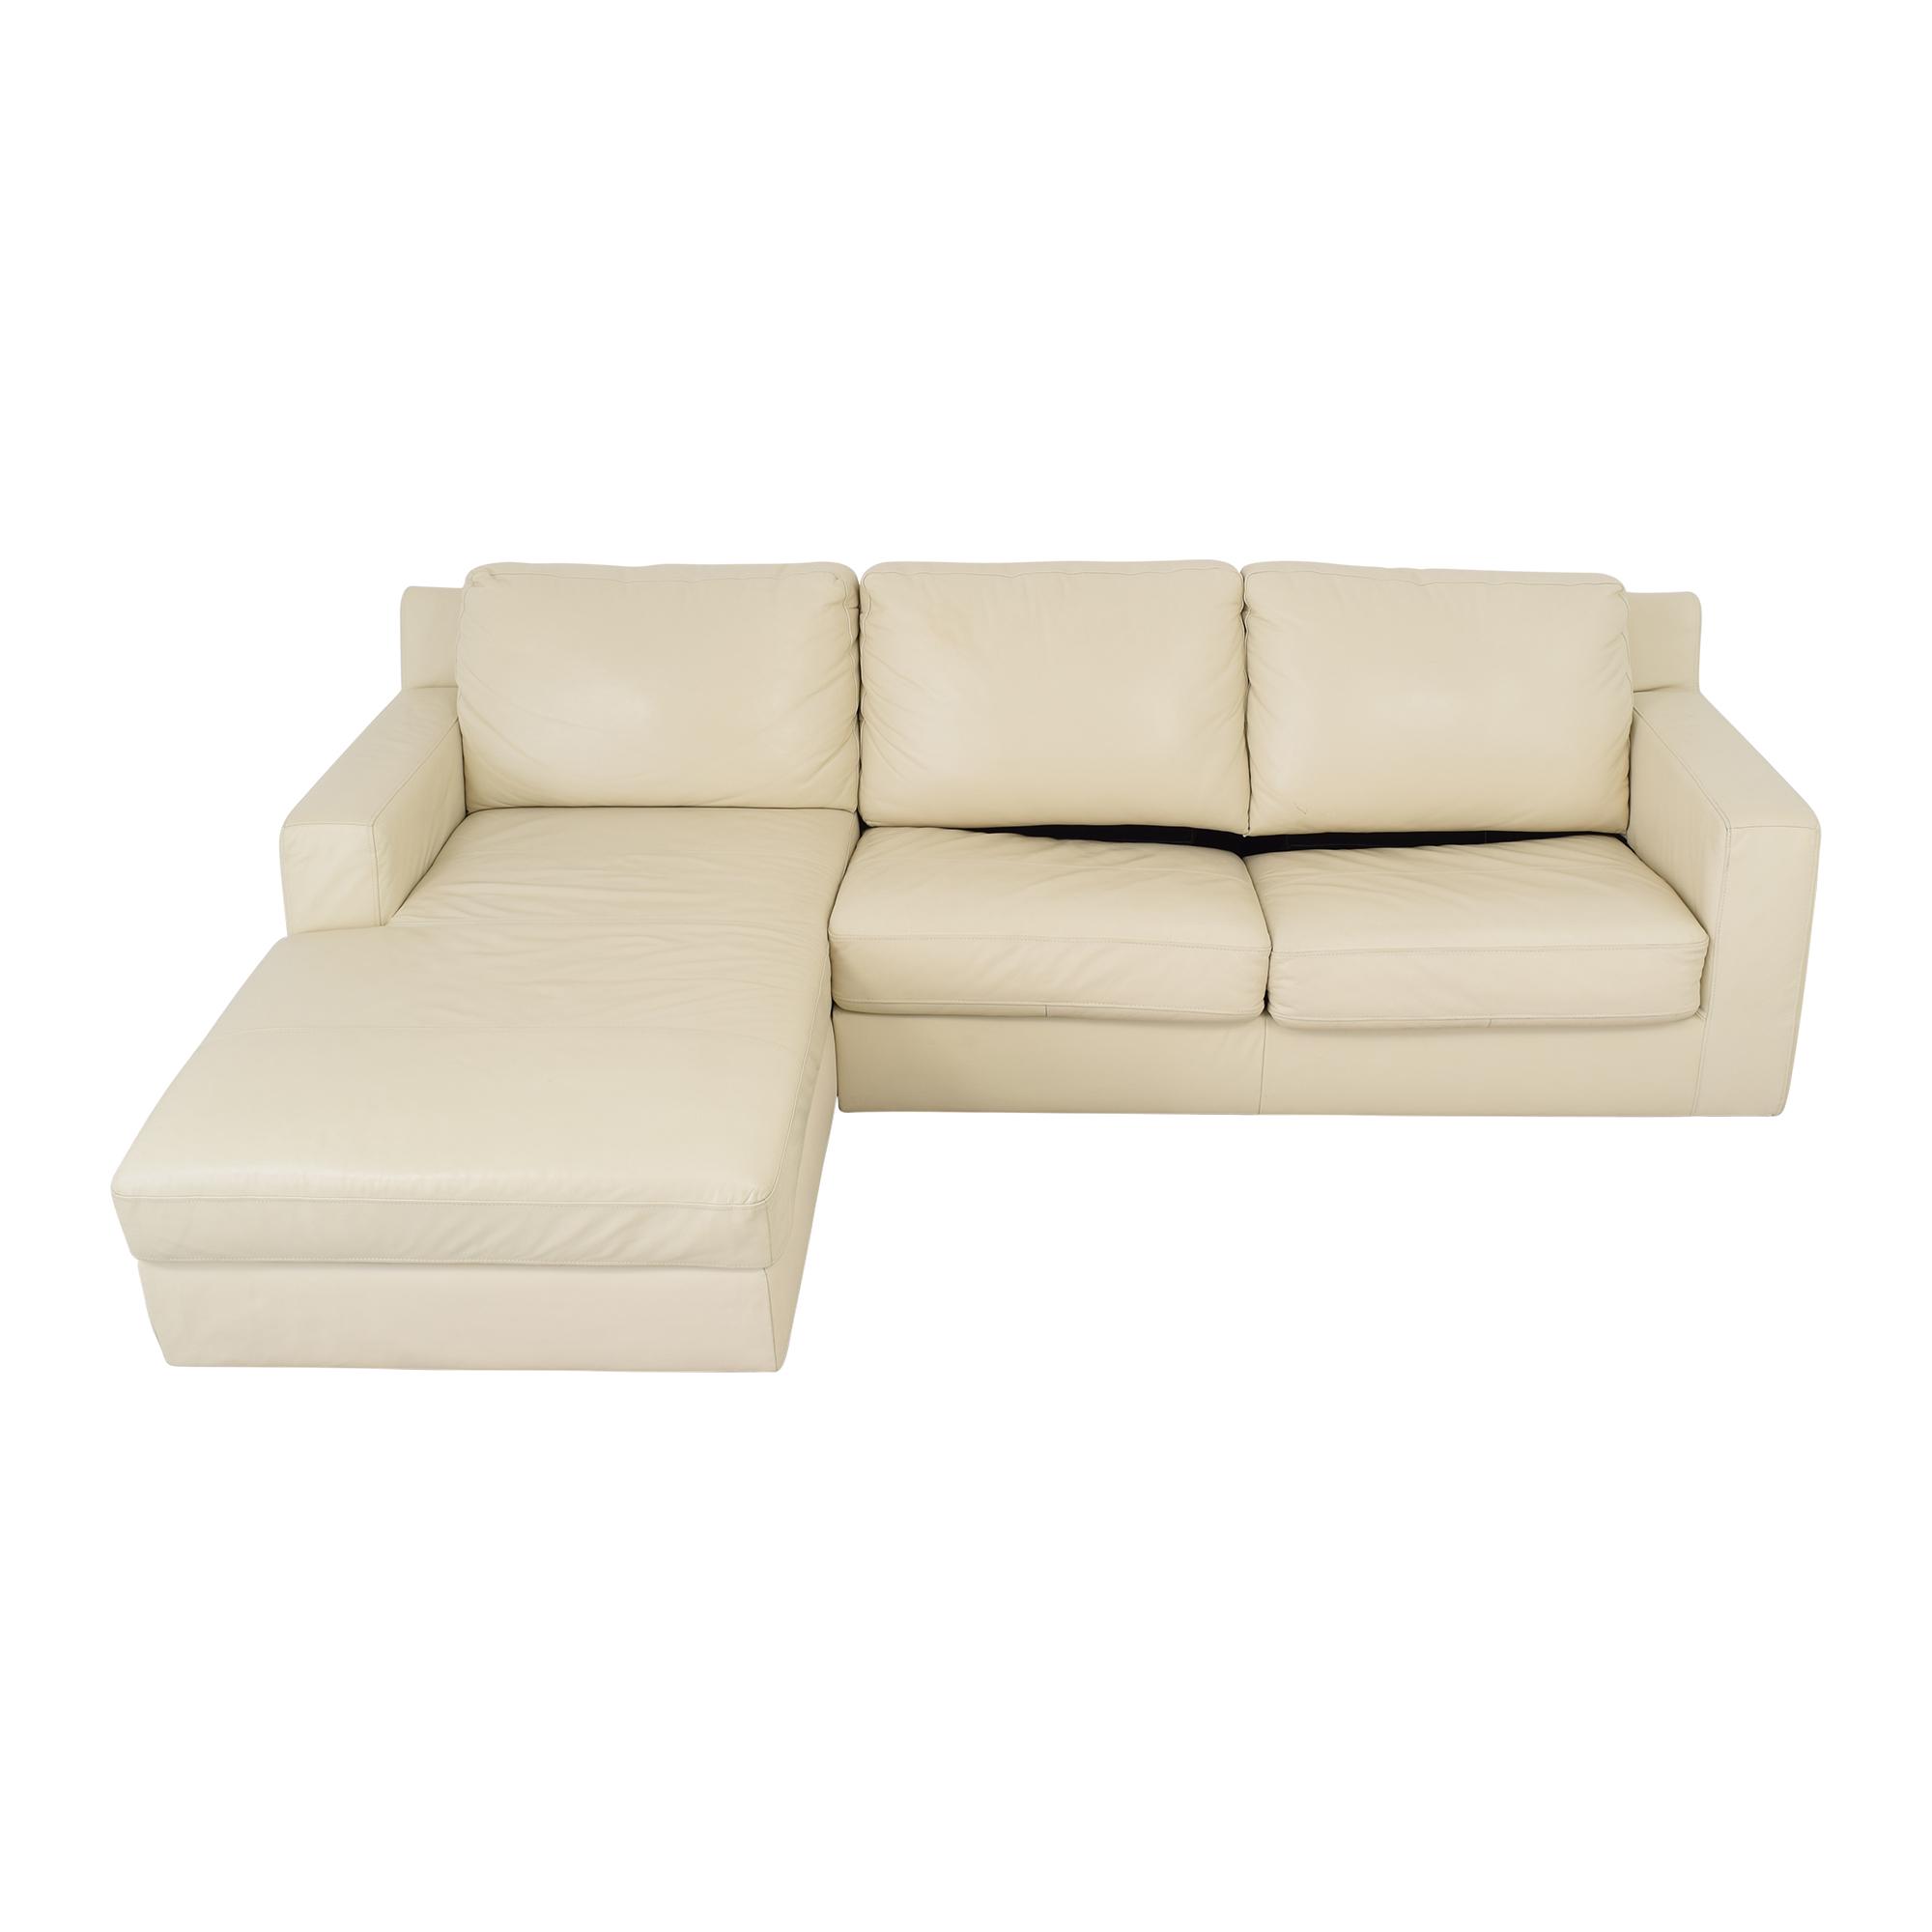 J&M Furniture J&M Furniture Jenny Sectional Sleeper Sofa used